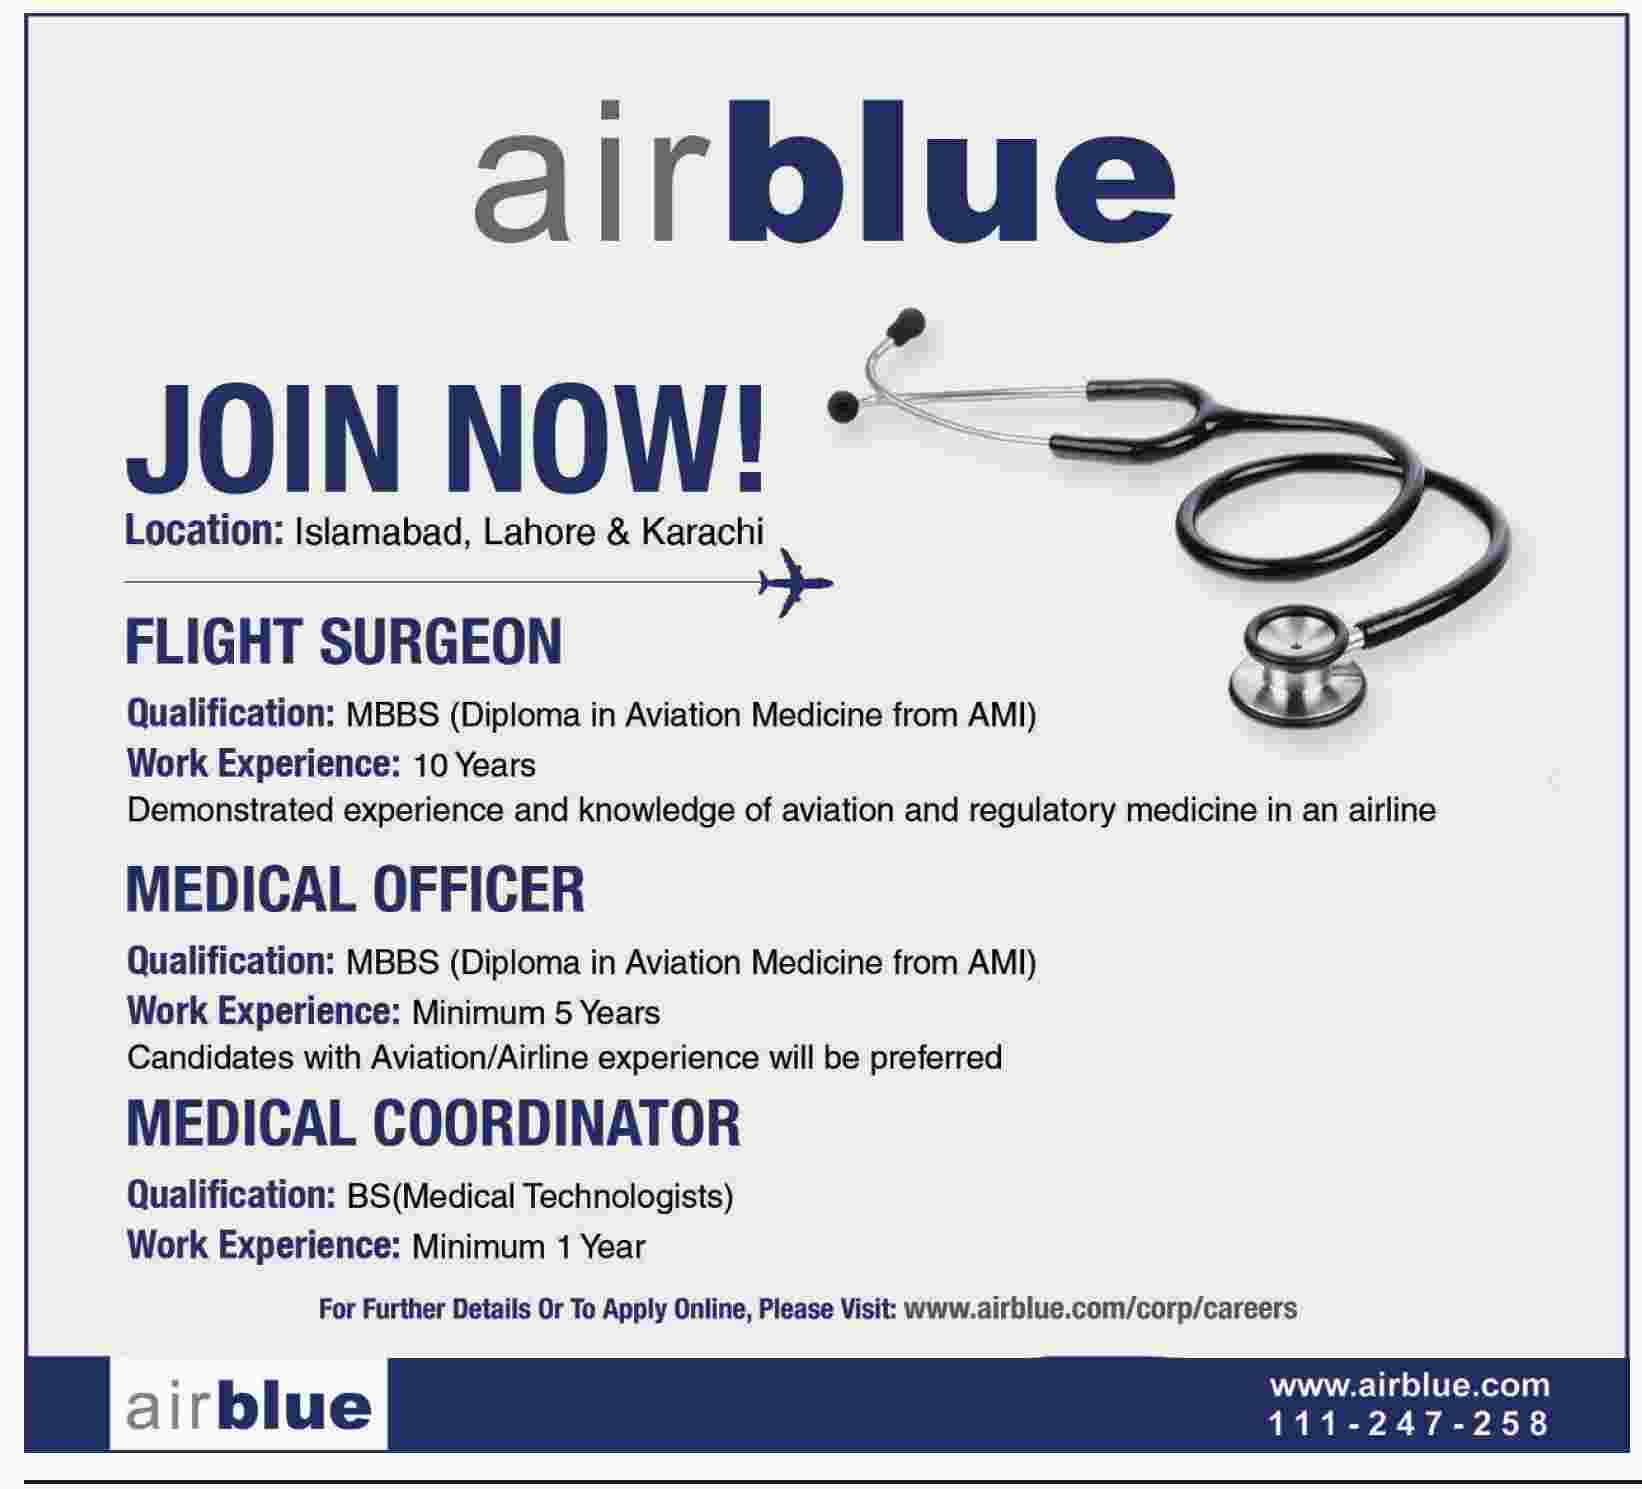 airblue-dwn